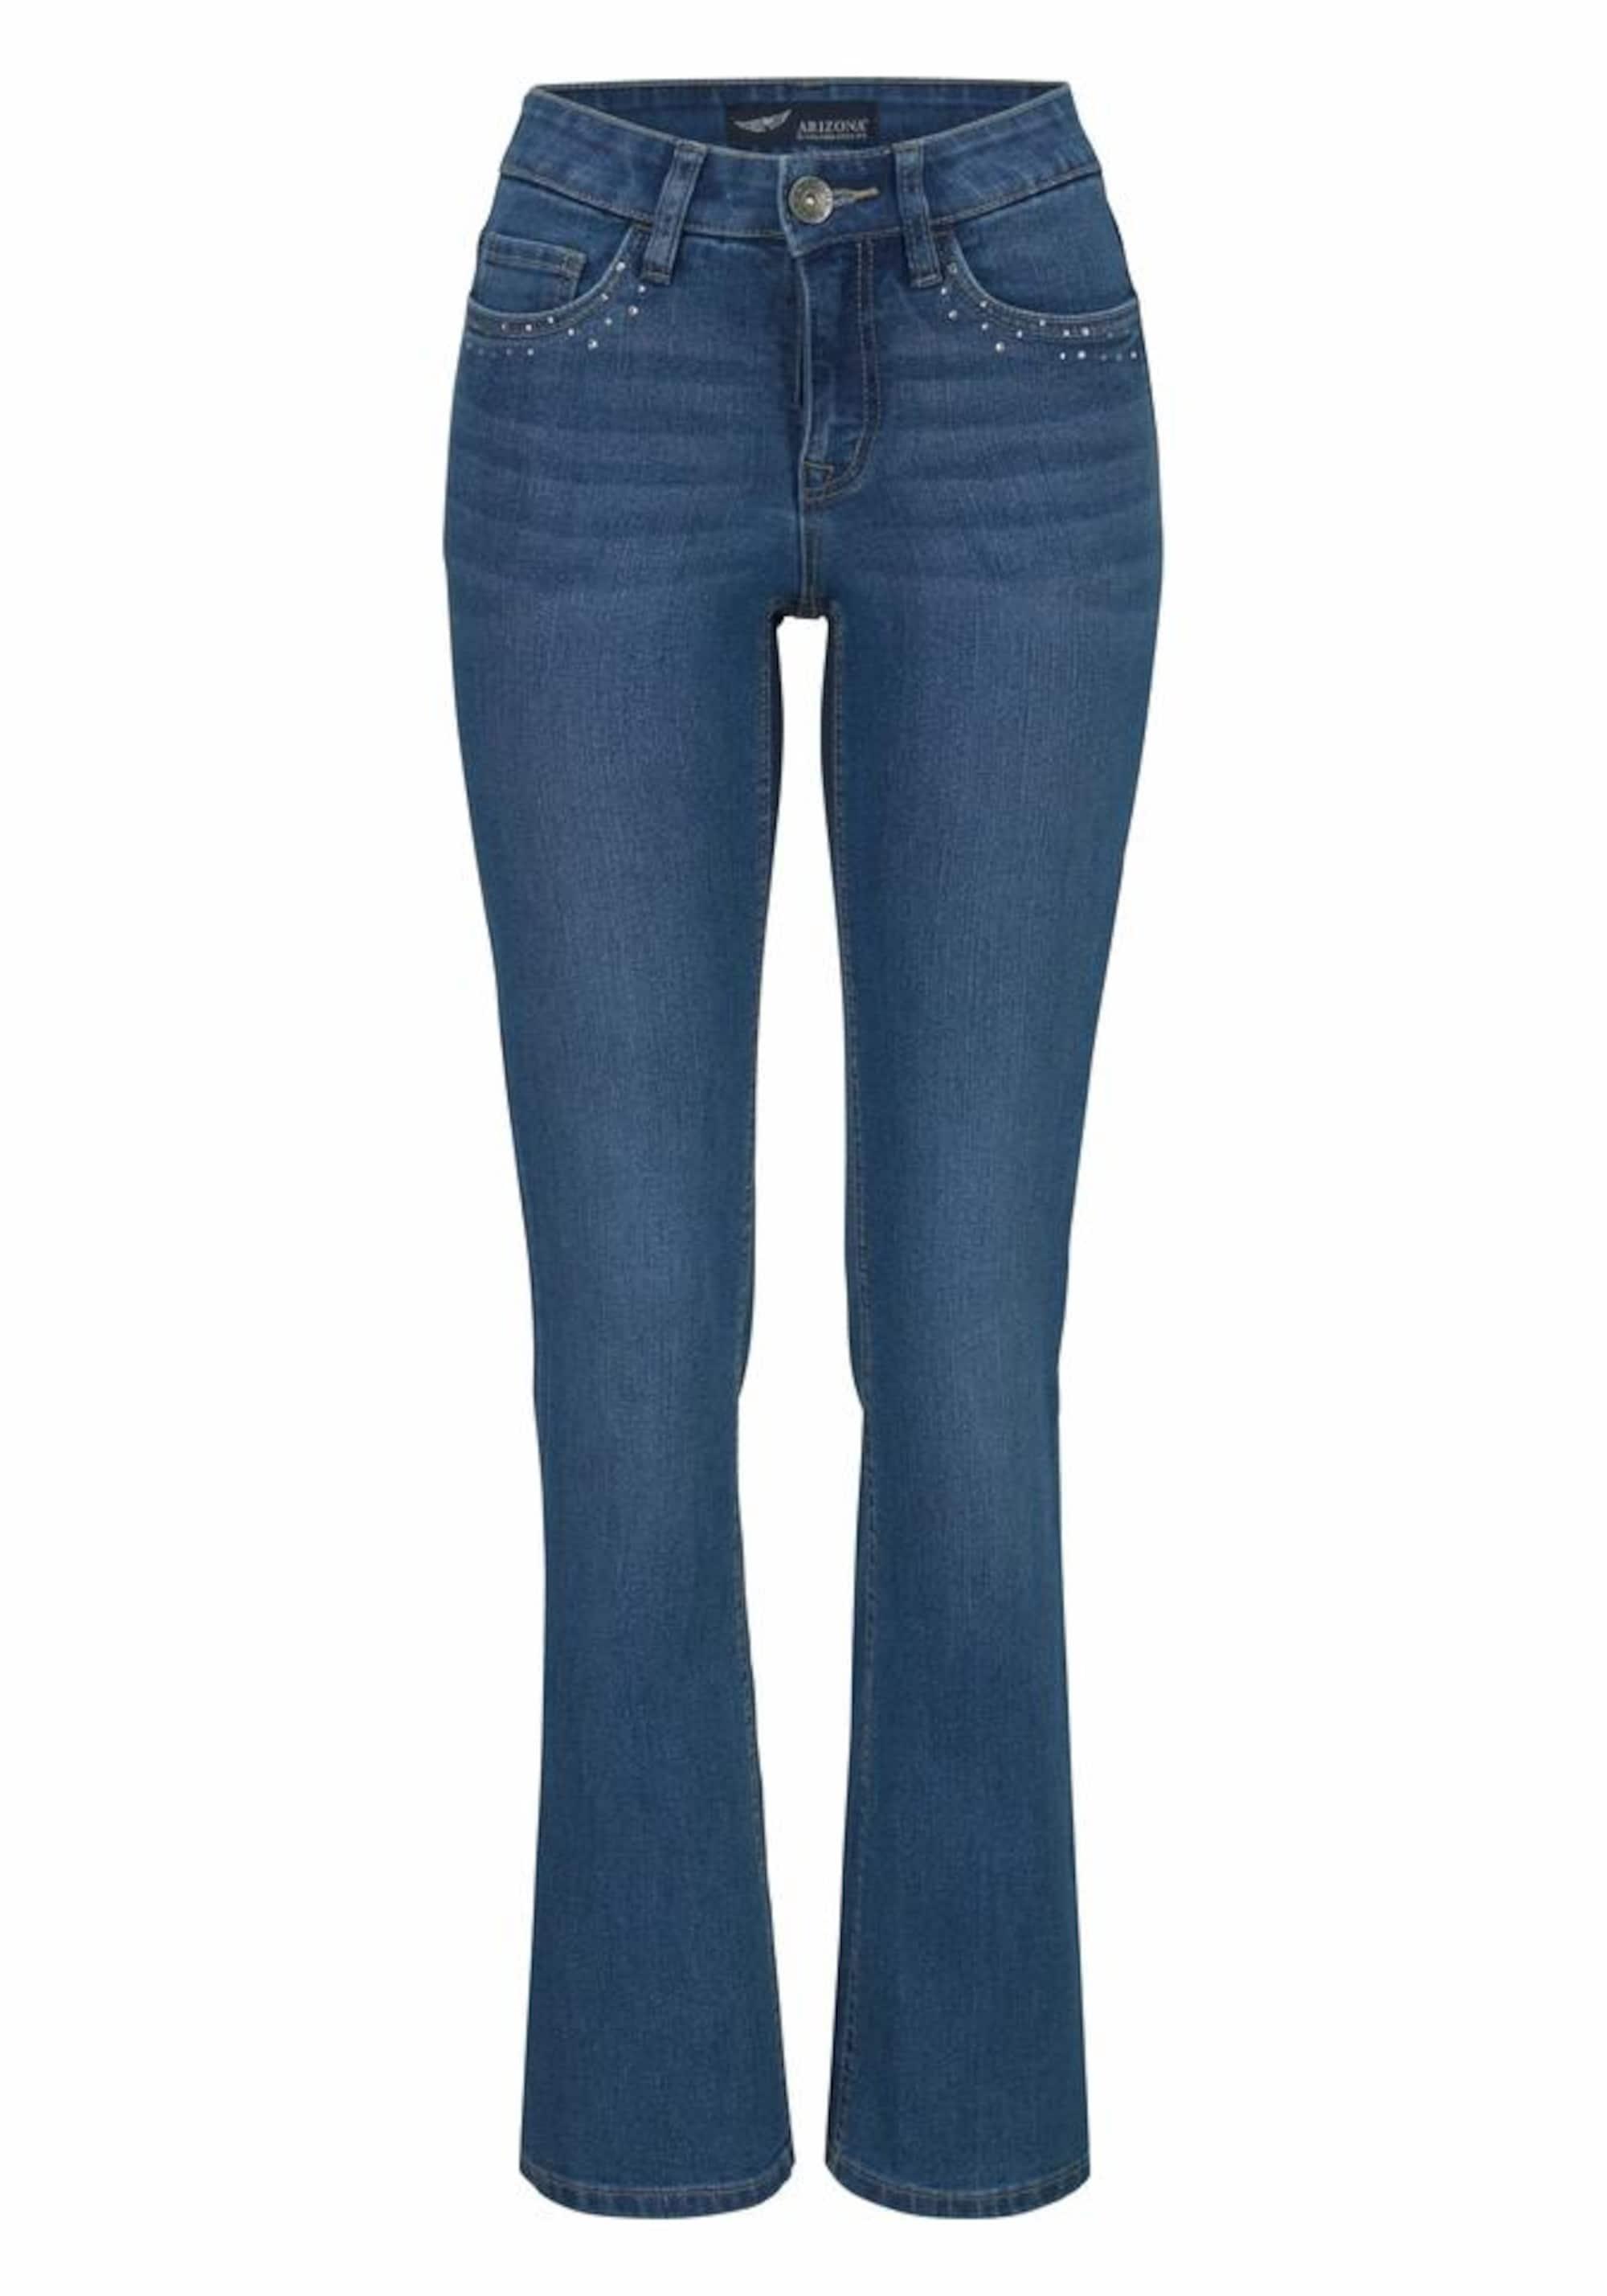 Image of Bootcut-Jeans mit Glitzerstein-Applikation